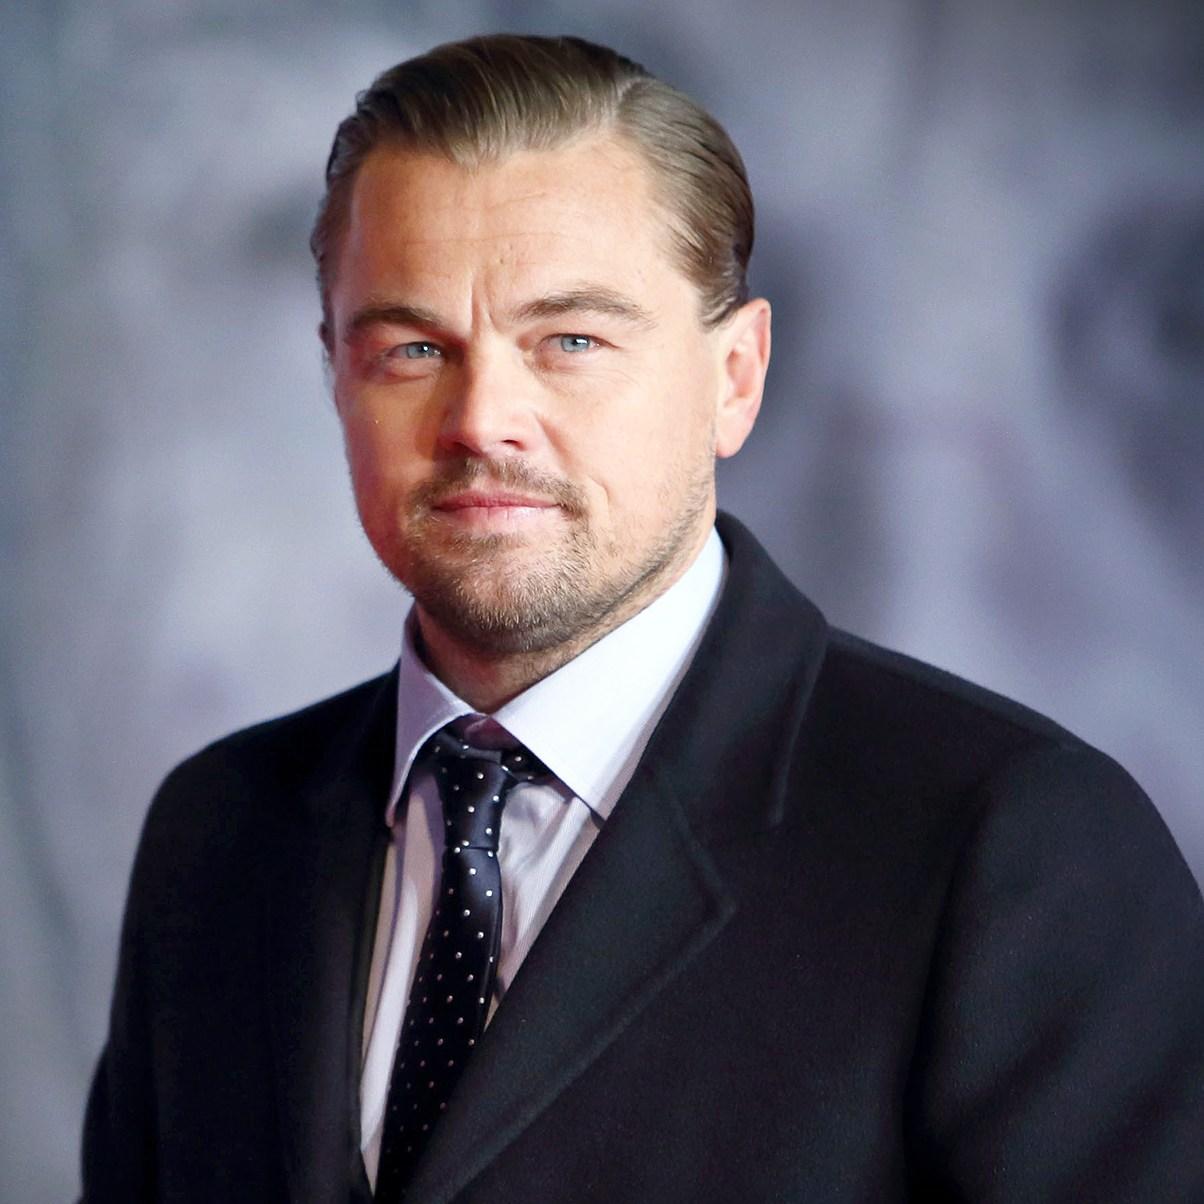 Leonardo DiCaprio turns 43